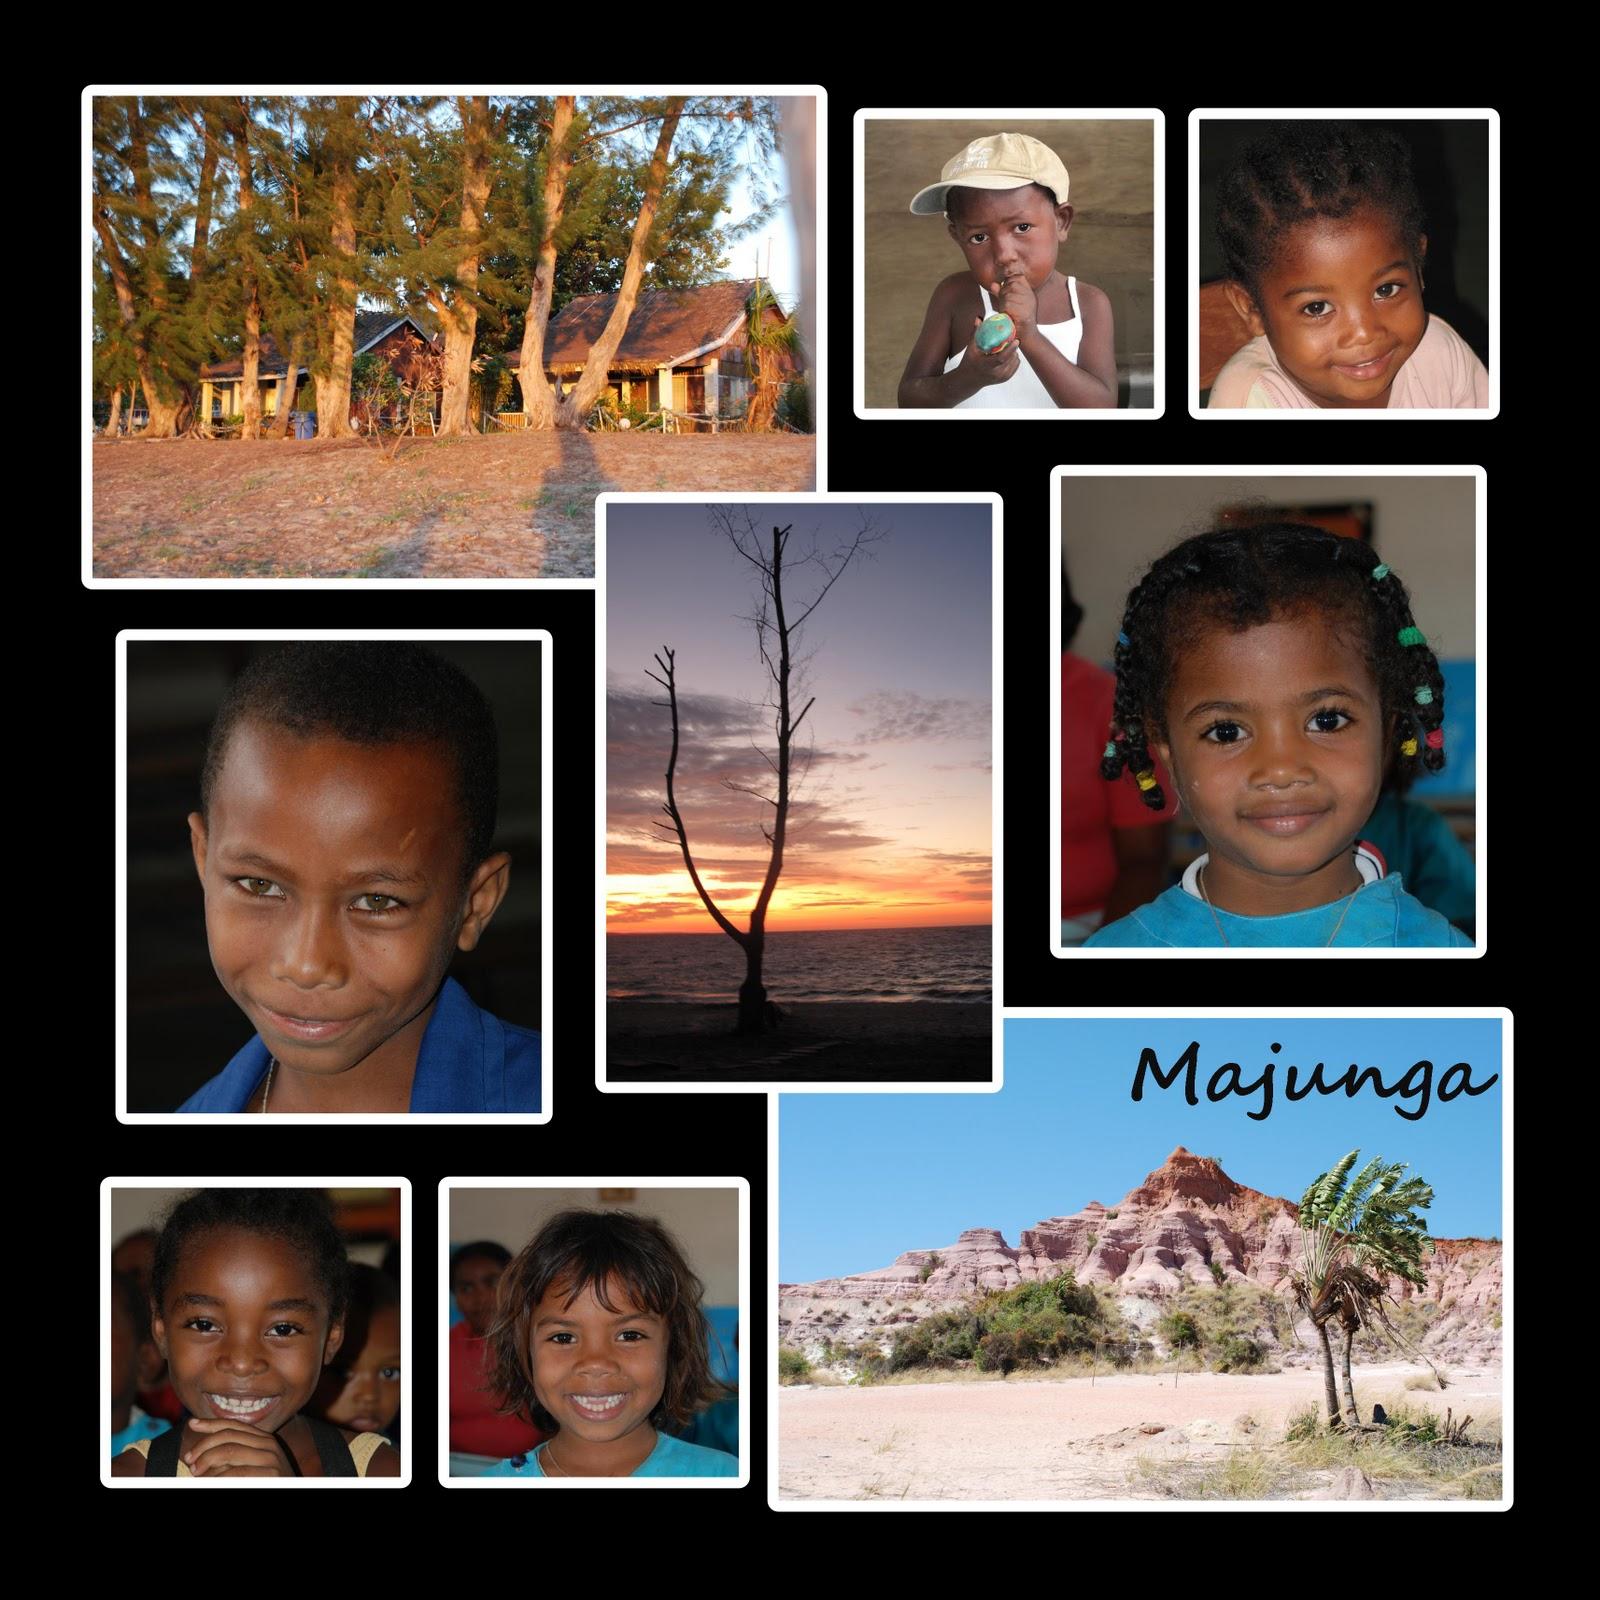 dentiste thonon les bains mission dentaire majunga mahajanga madagascar